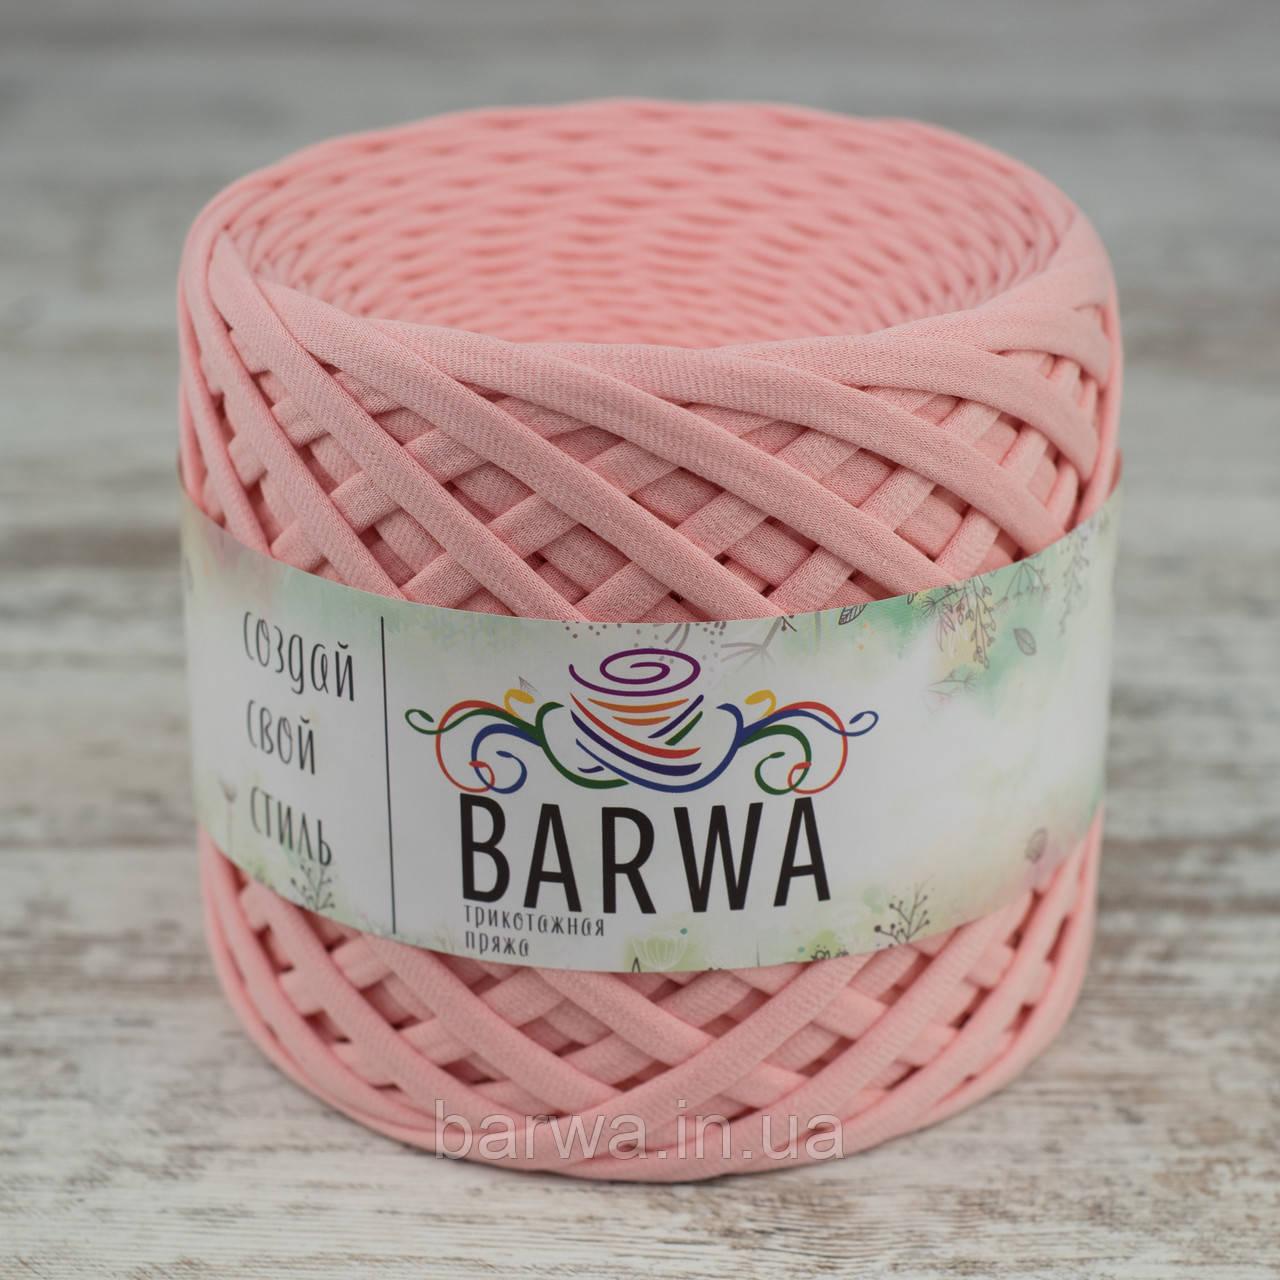 Трикотажная пряжа BARWA uitra light 3-5 мм, Фламинго